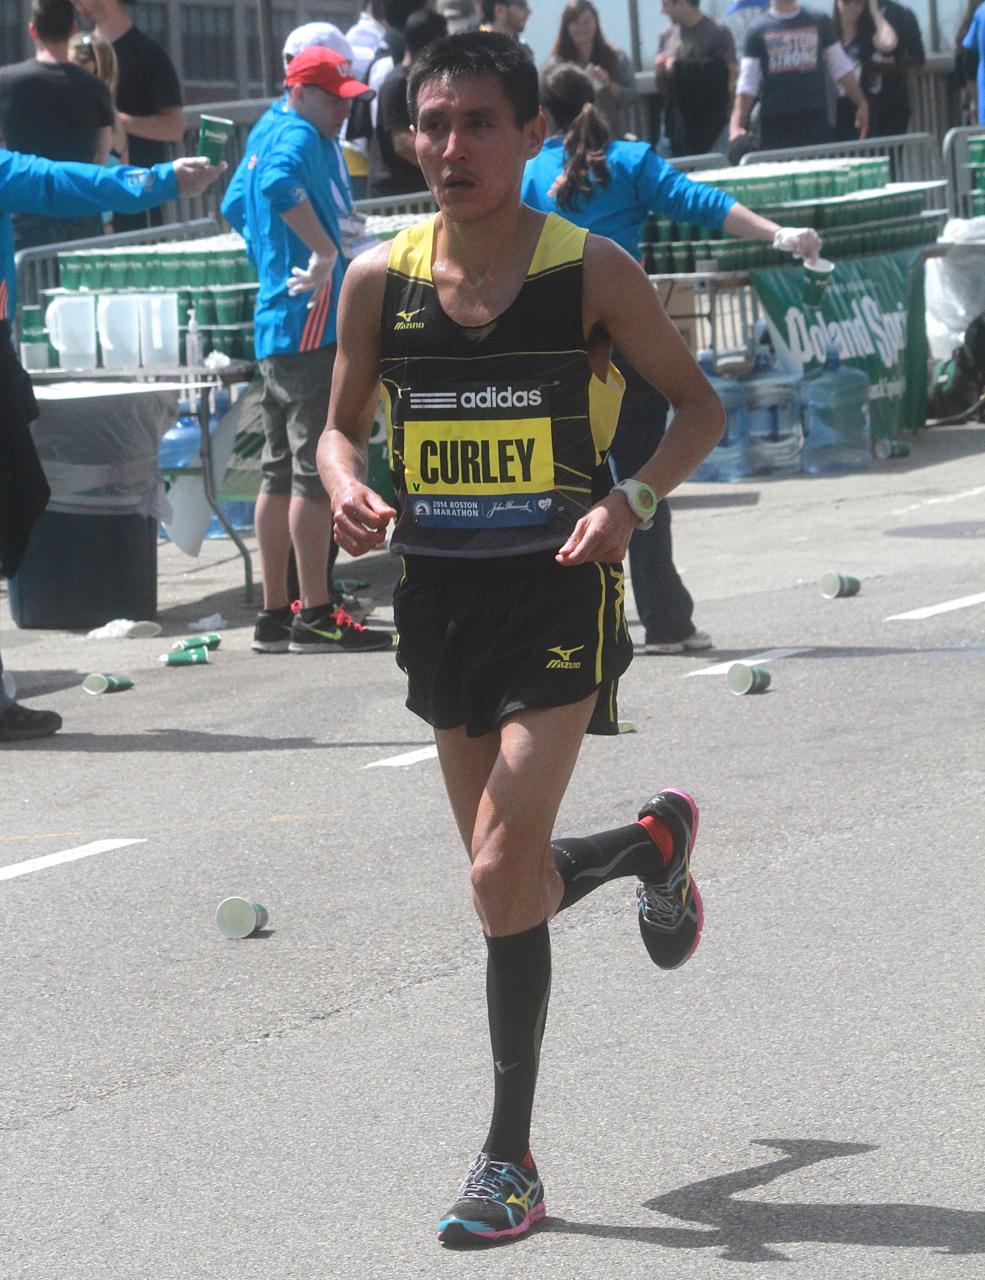 boston marathon april 21 beacon street elite runners curley